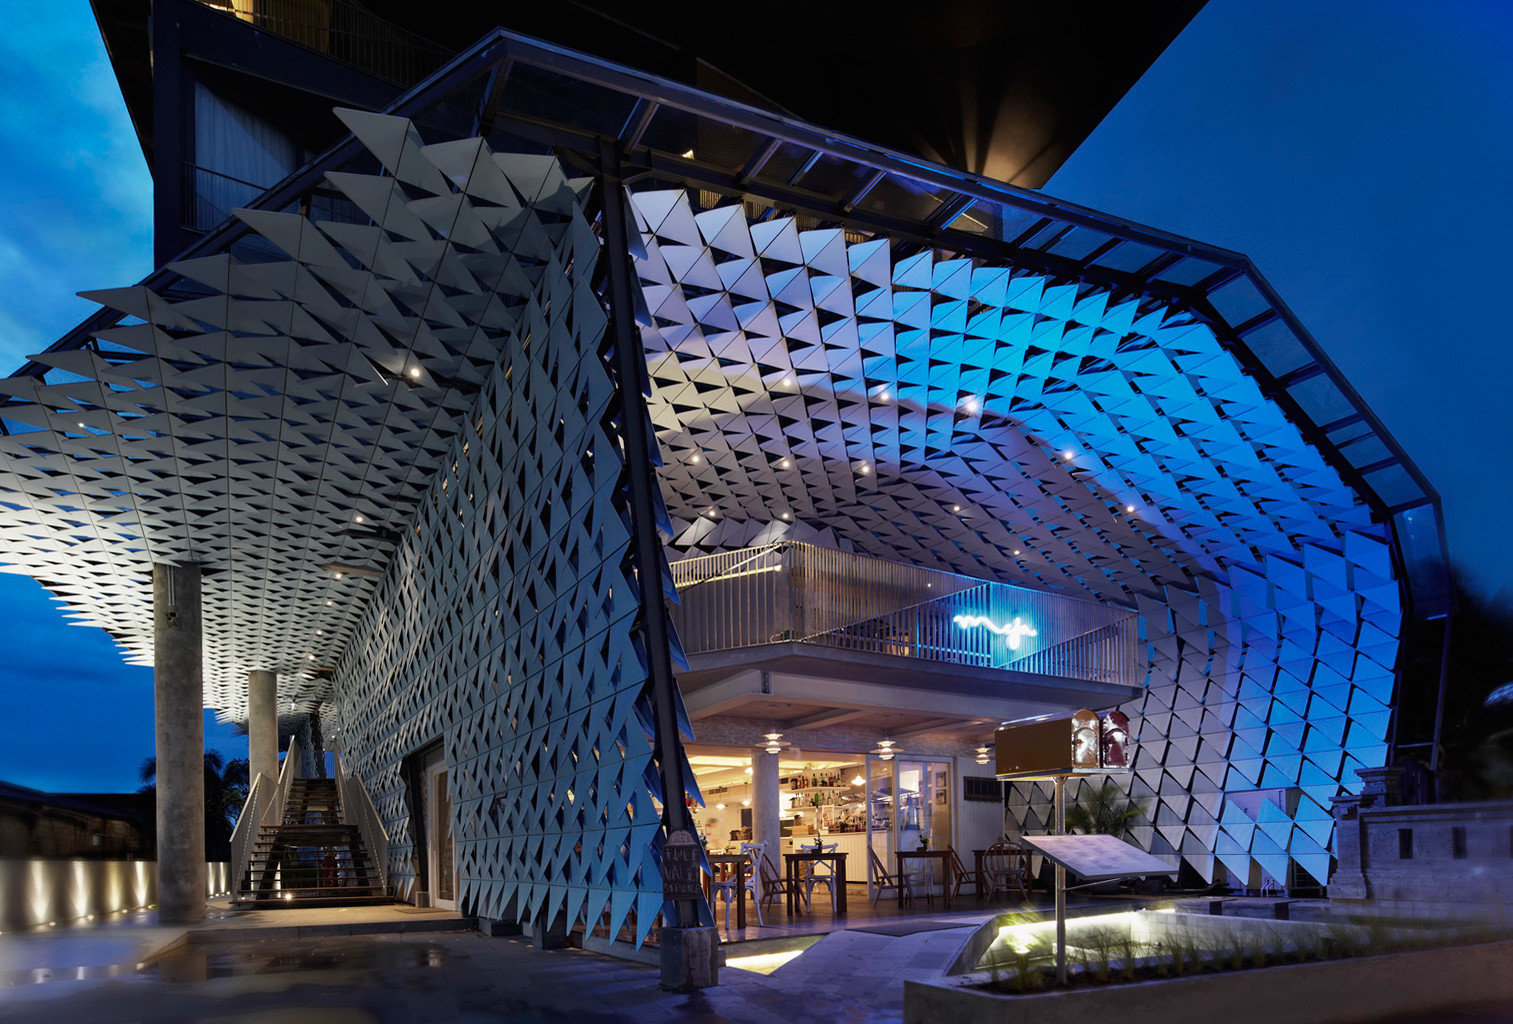 Exterior Luxury Modern Architecture night lighting convention center